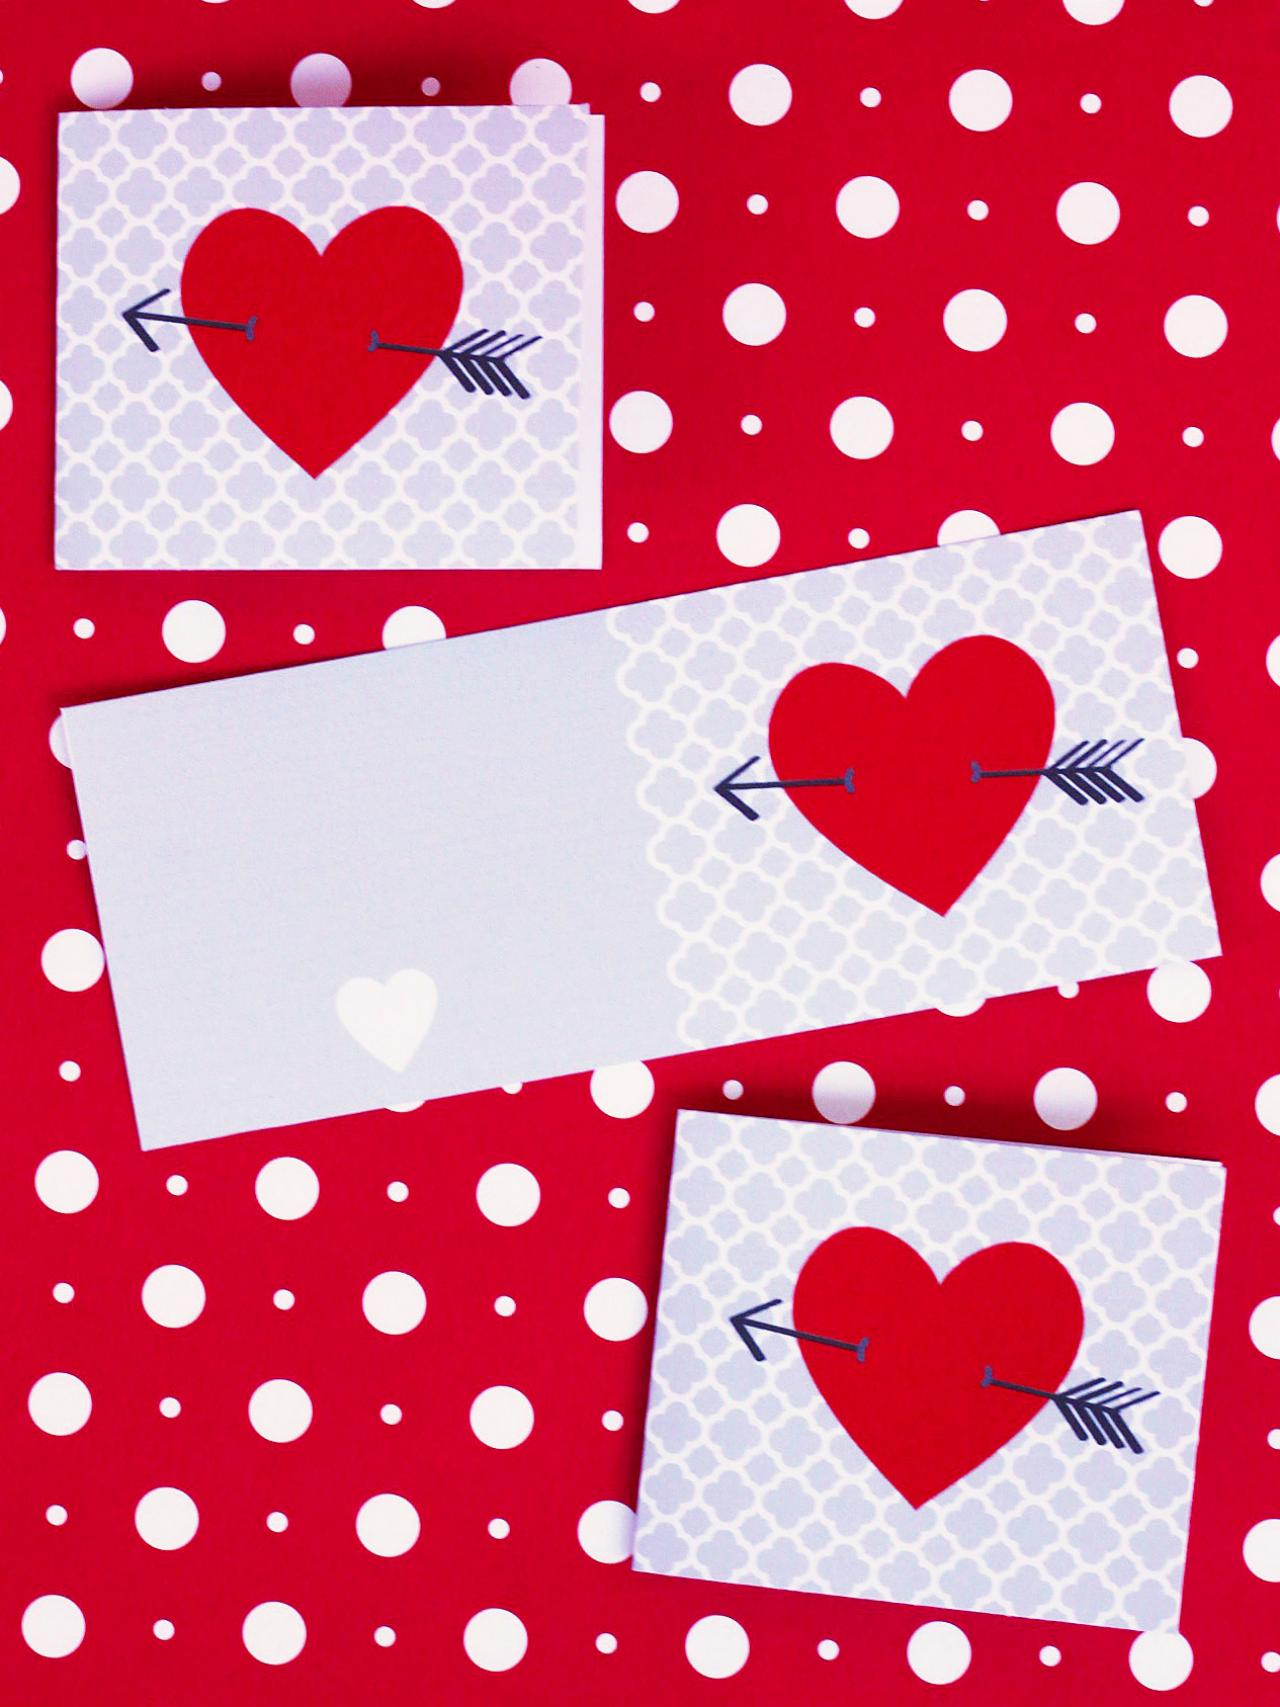 Easy Homemade Valentine's Day Cards | DIY Network Blog ...